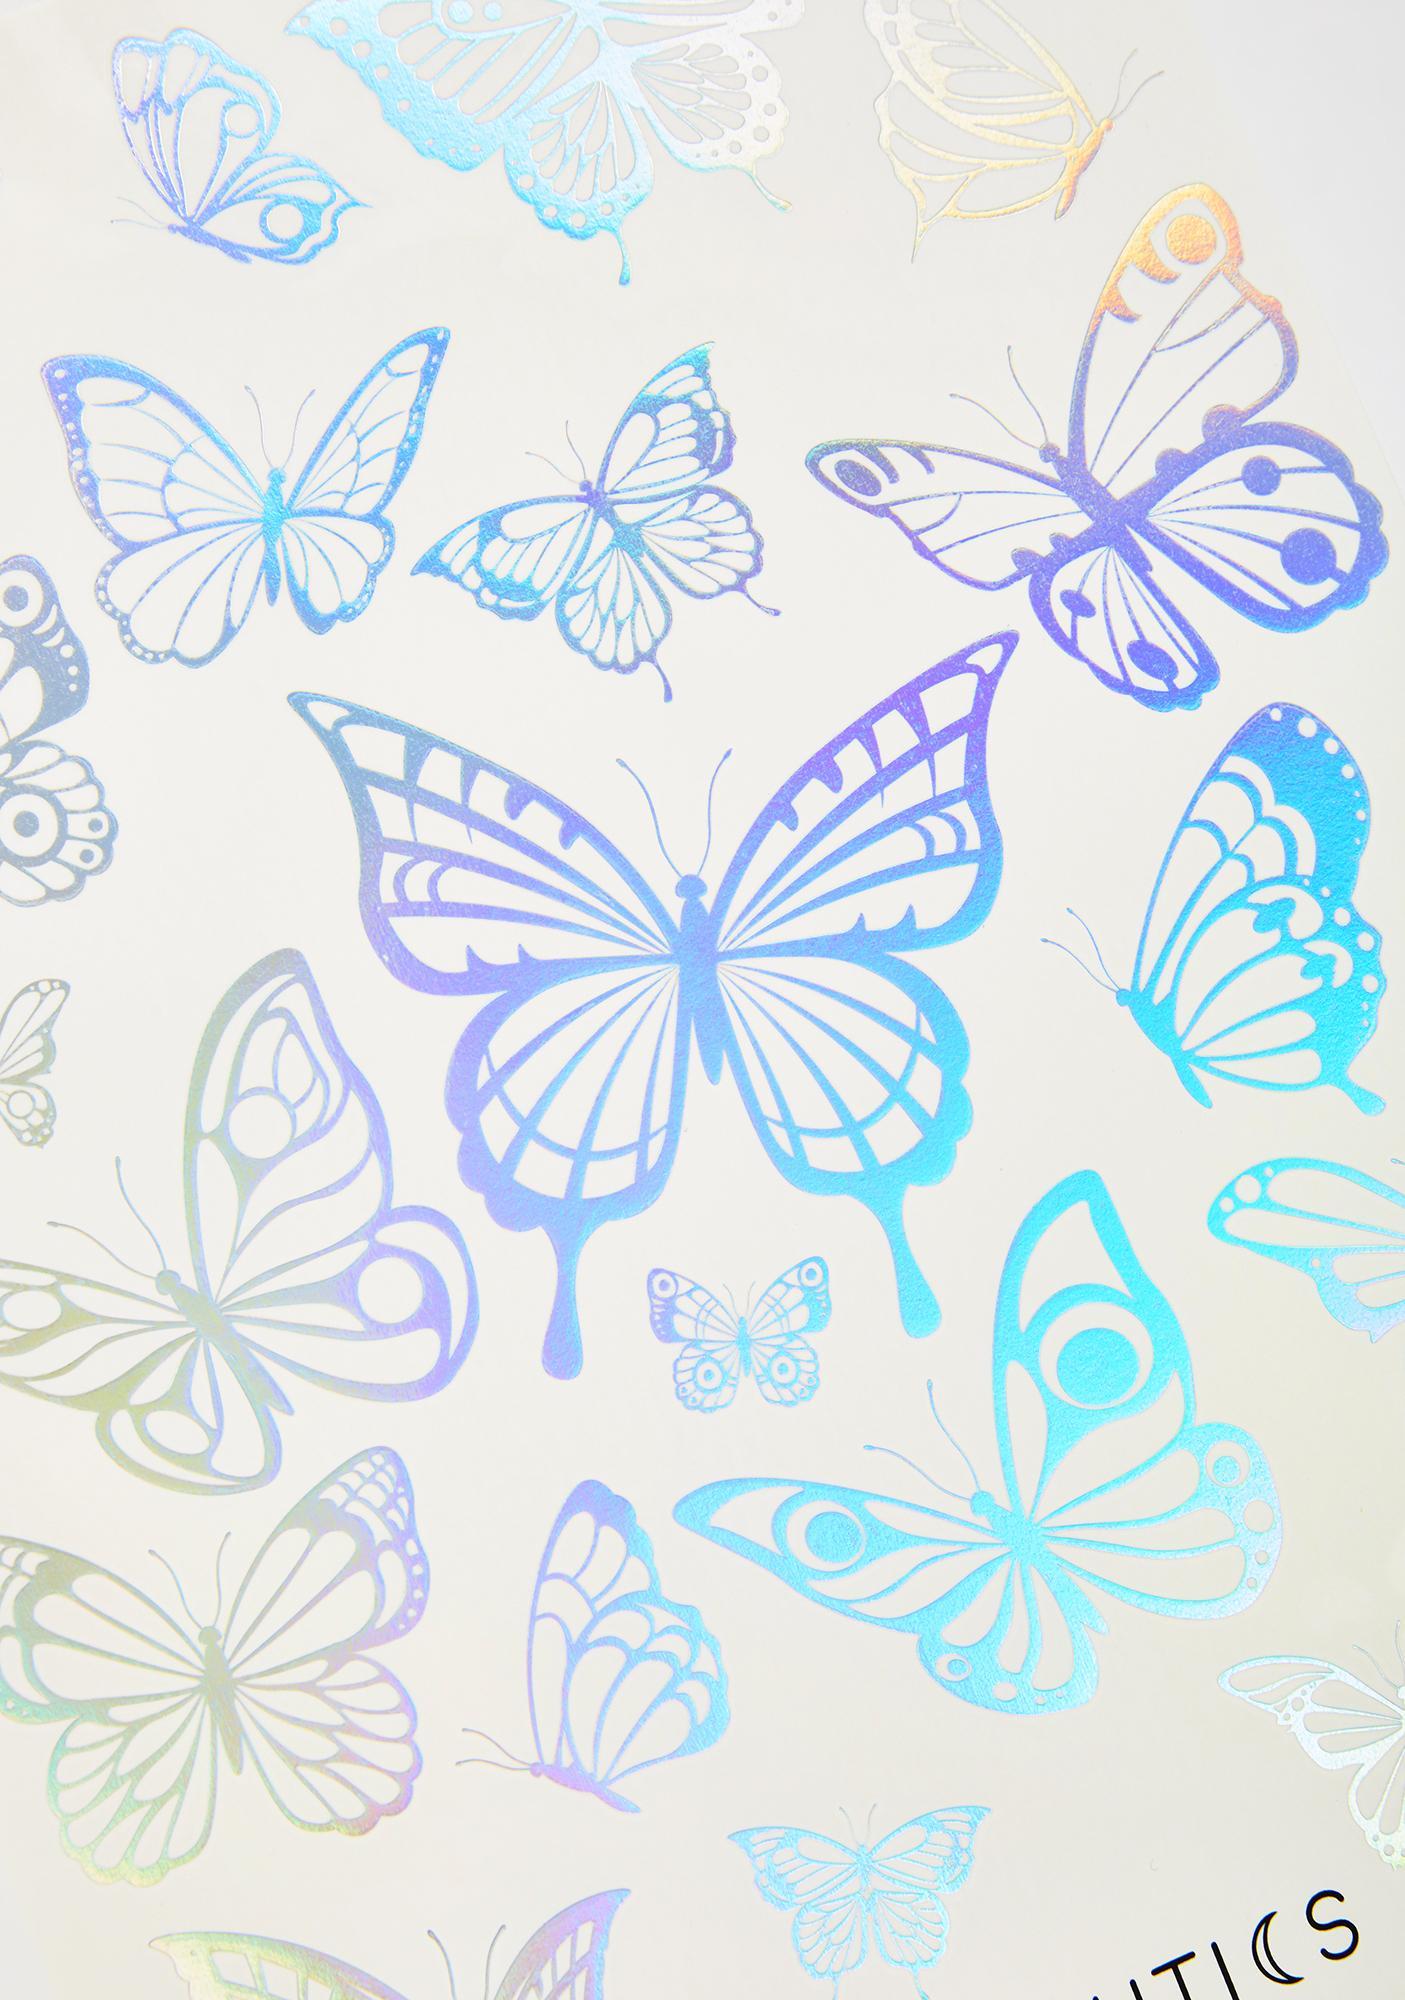 Lunautics Pretty Fly Temporary Tattoos